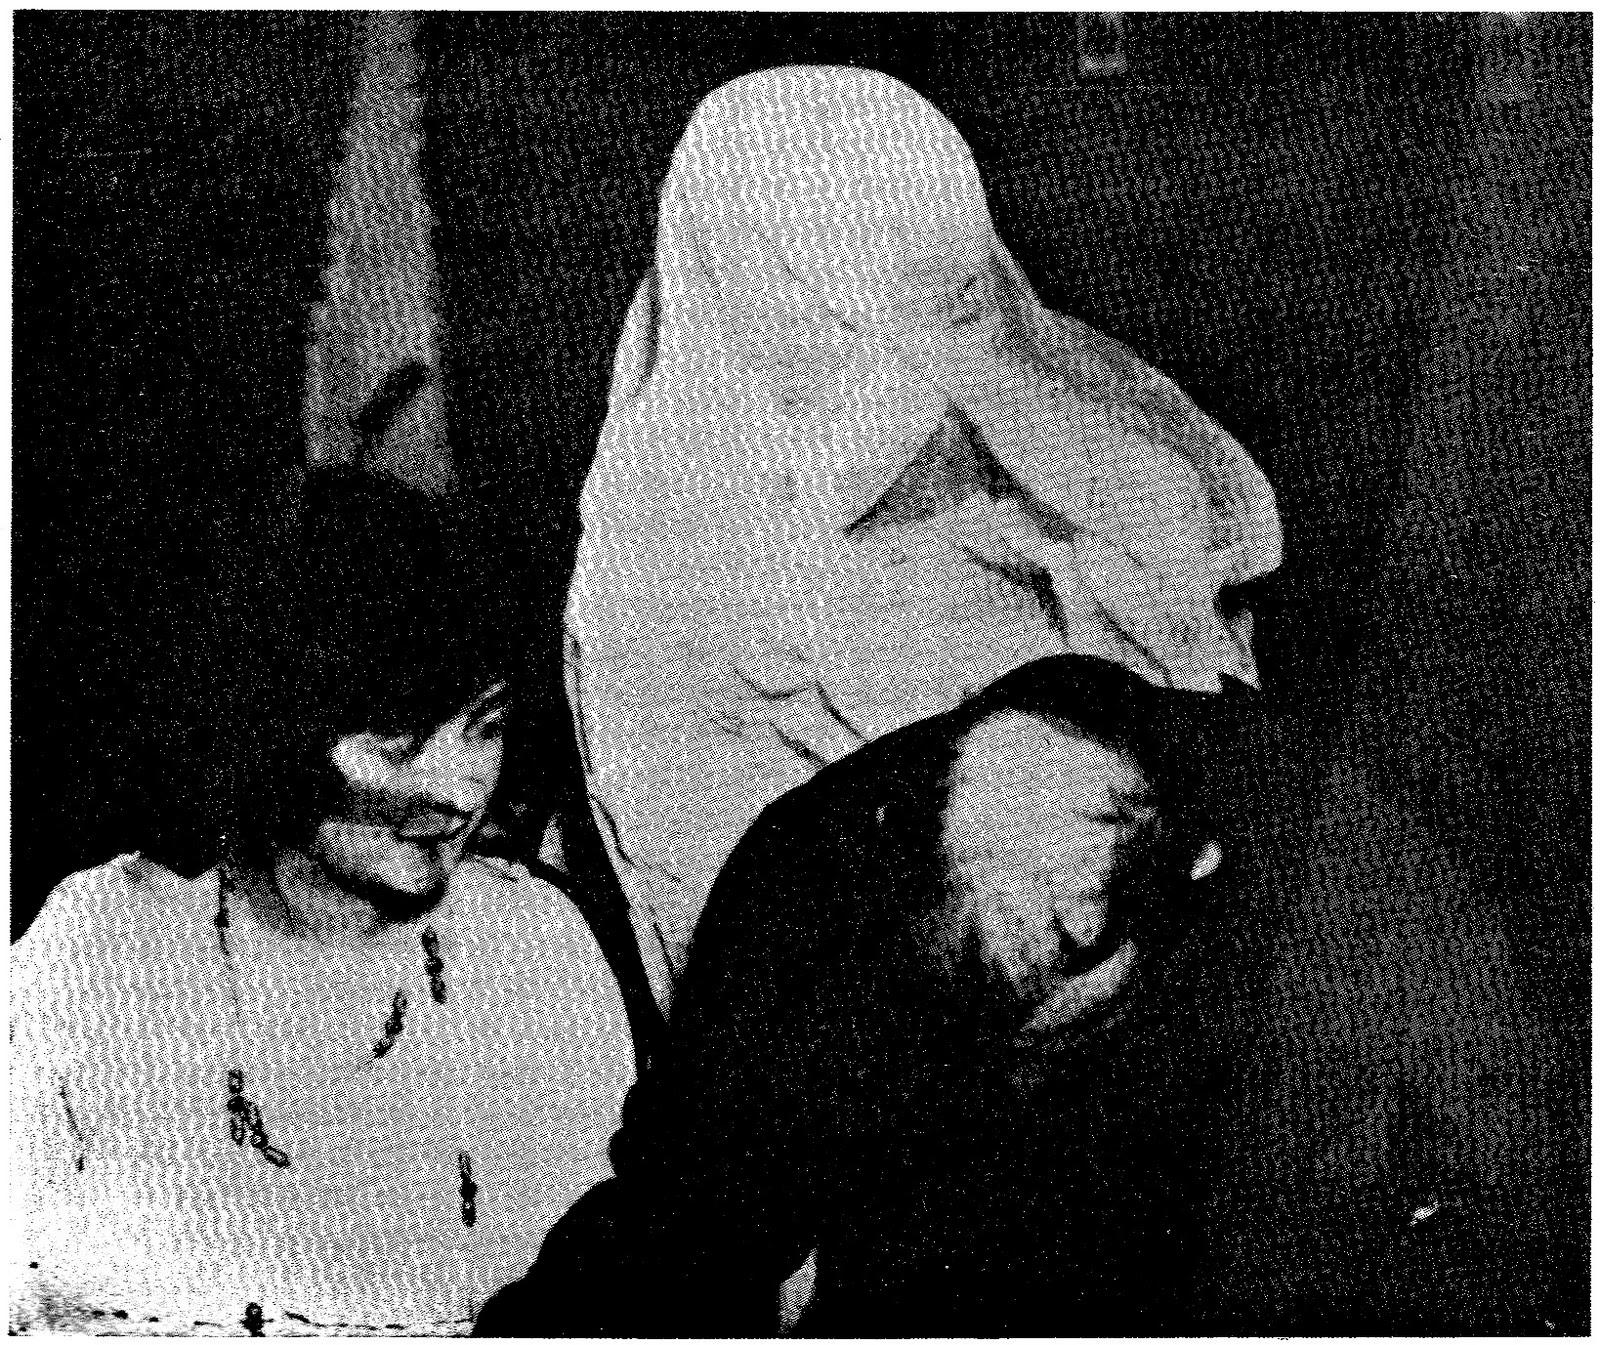 Manifesting Spirits – A Paranormal Theory